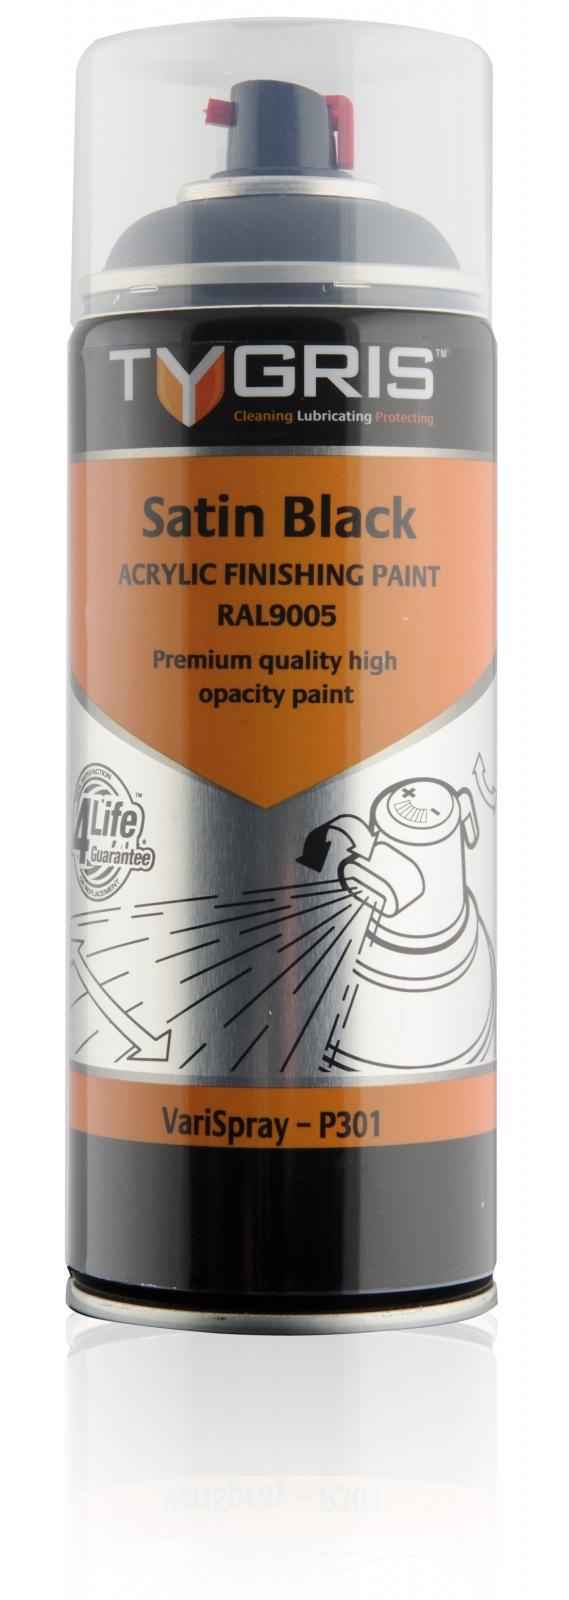 P301 Satin Black Paint RAL9005 400ml